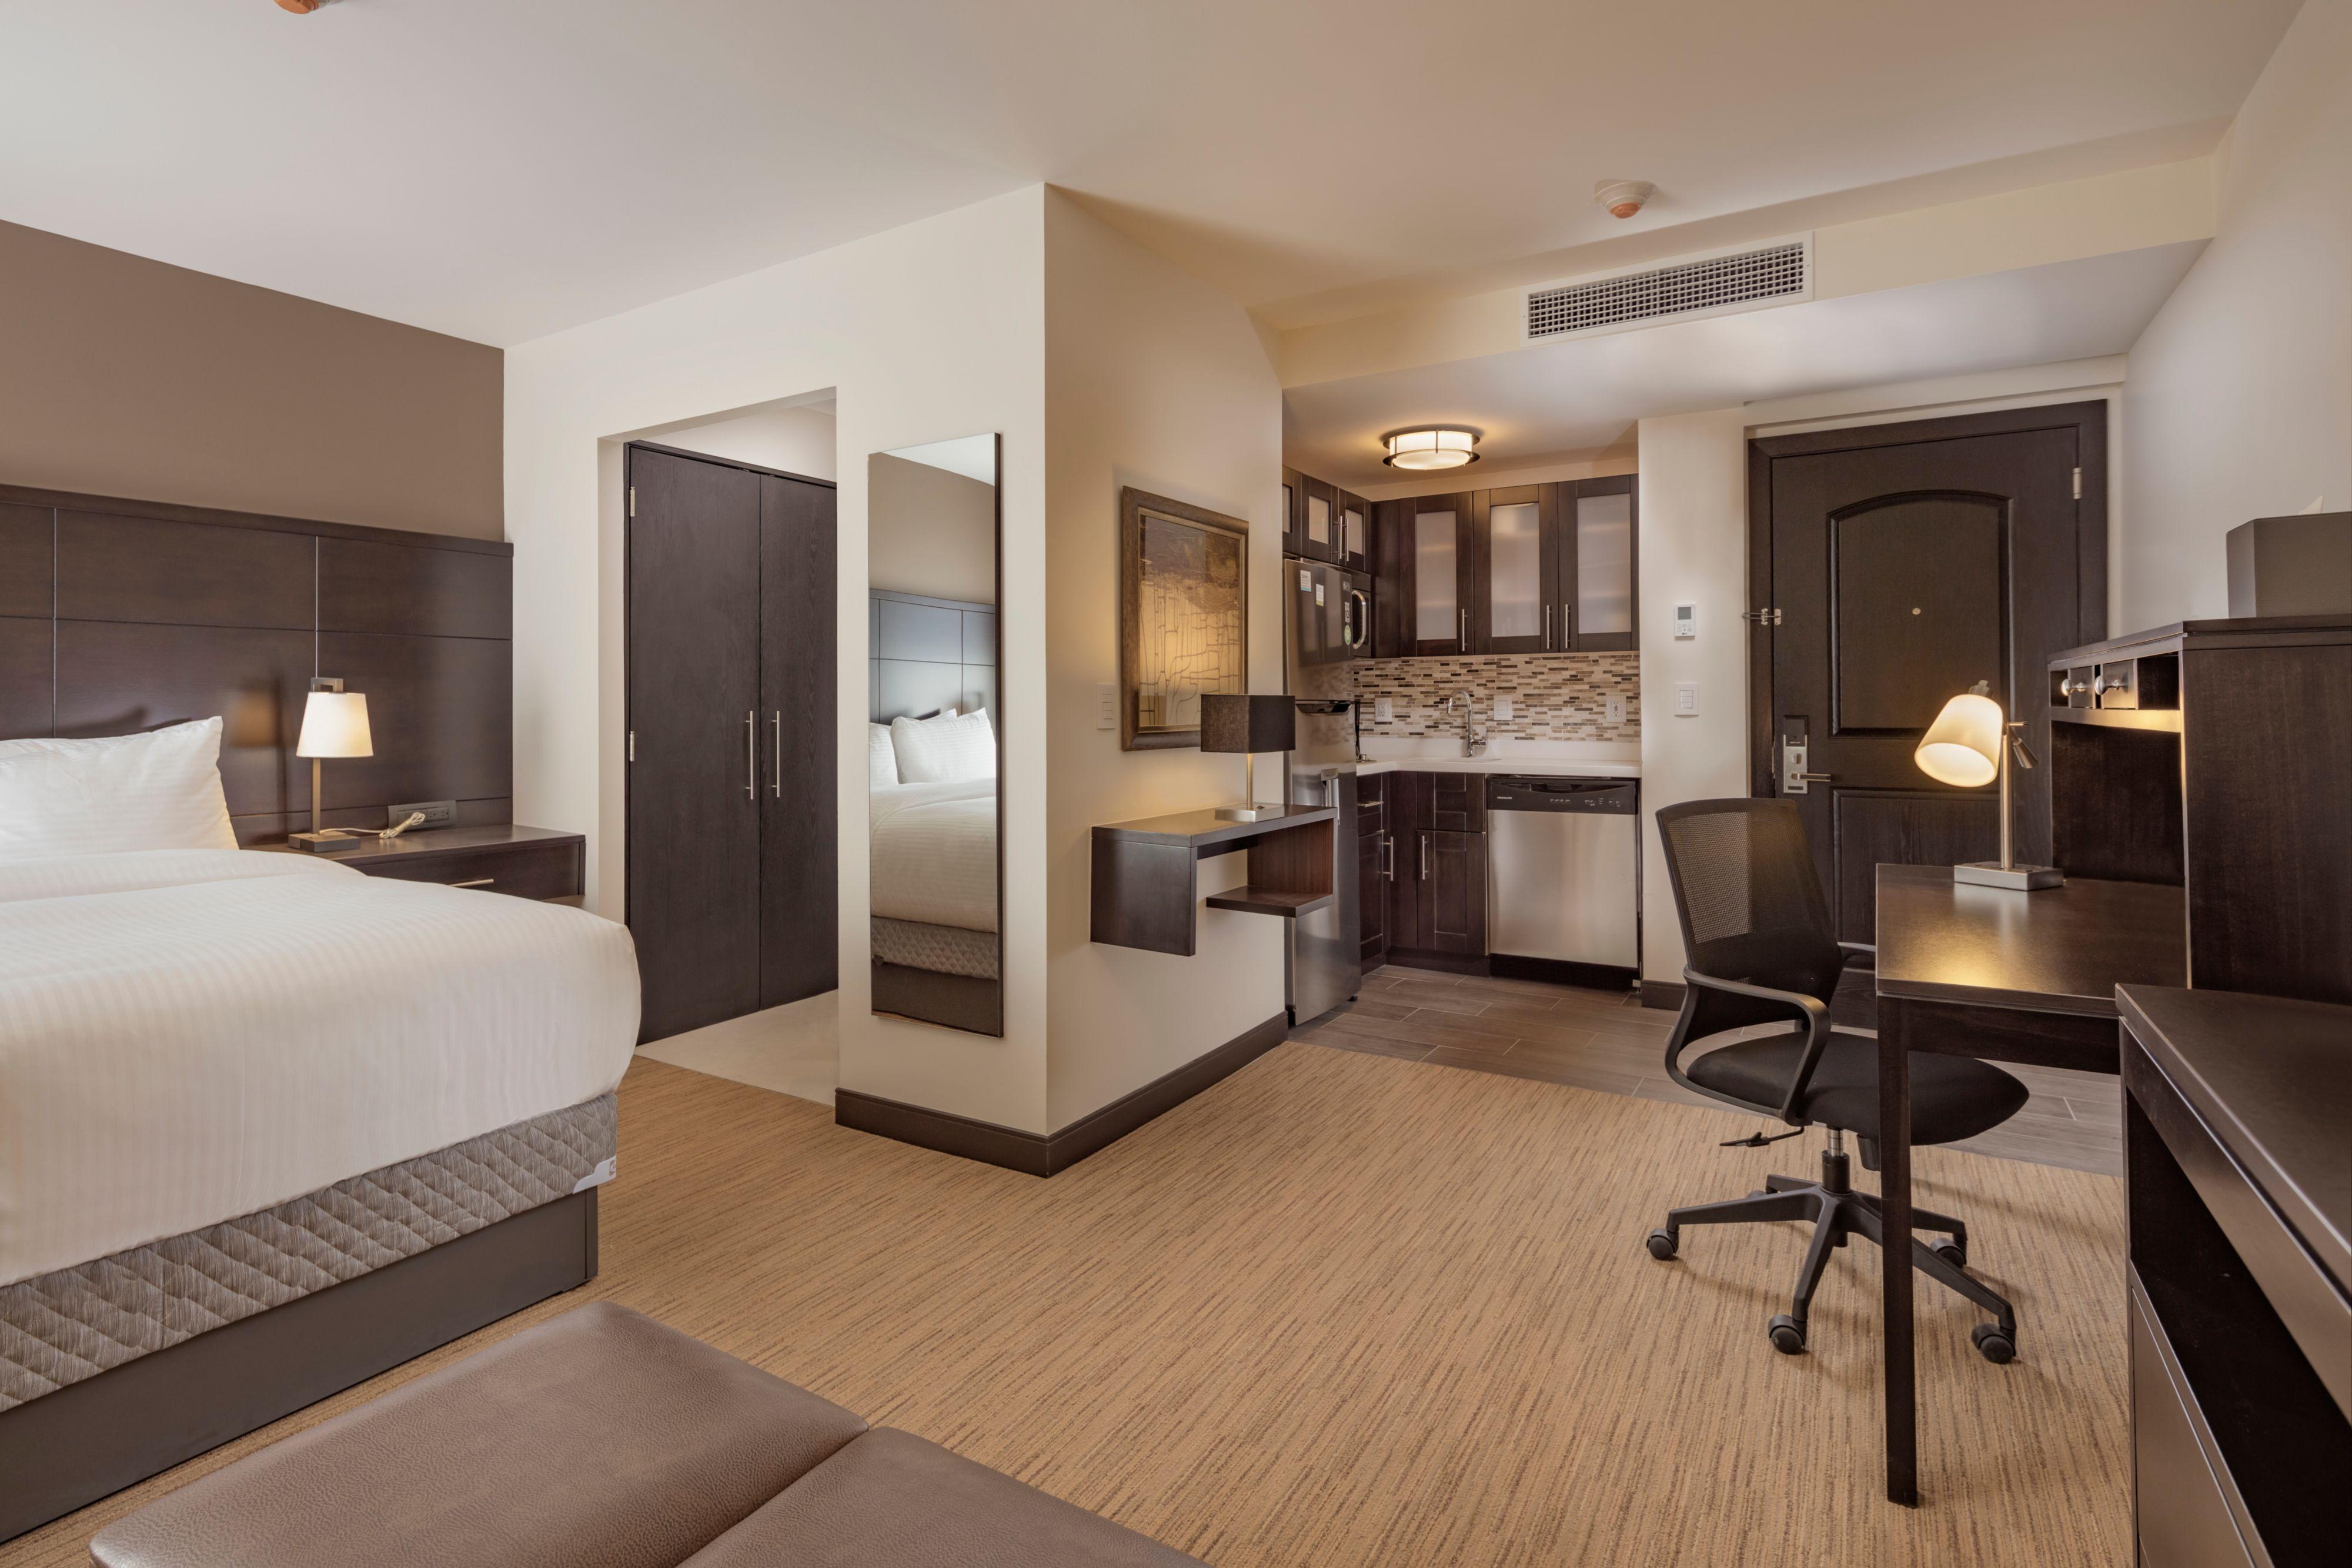 Staybridge Suites Saltillo